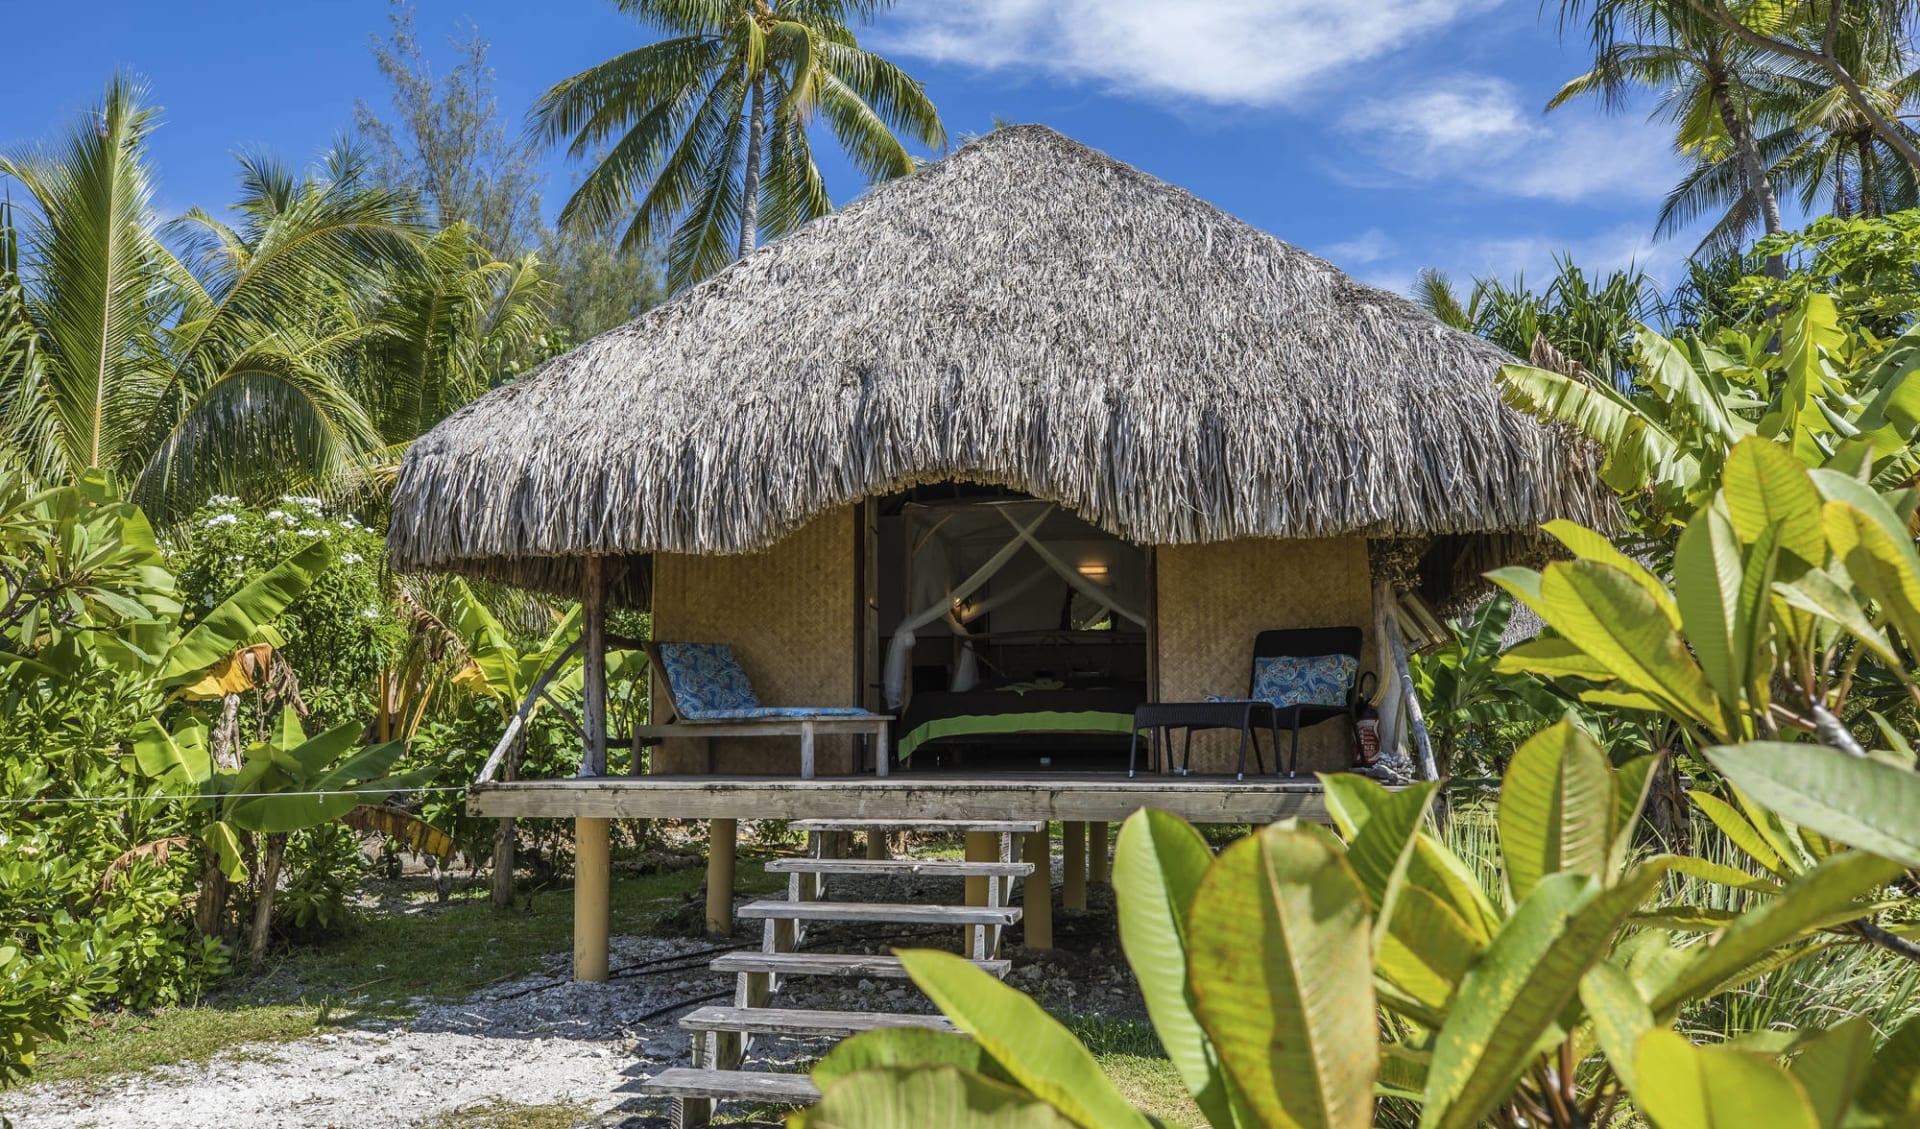 Pension Alice et Raphael in Bora Bora:  BOB Pension Alice et Raphael (cpr M.Brightwell) (15)